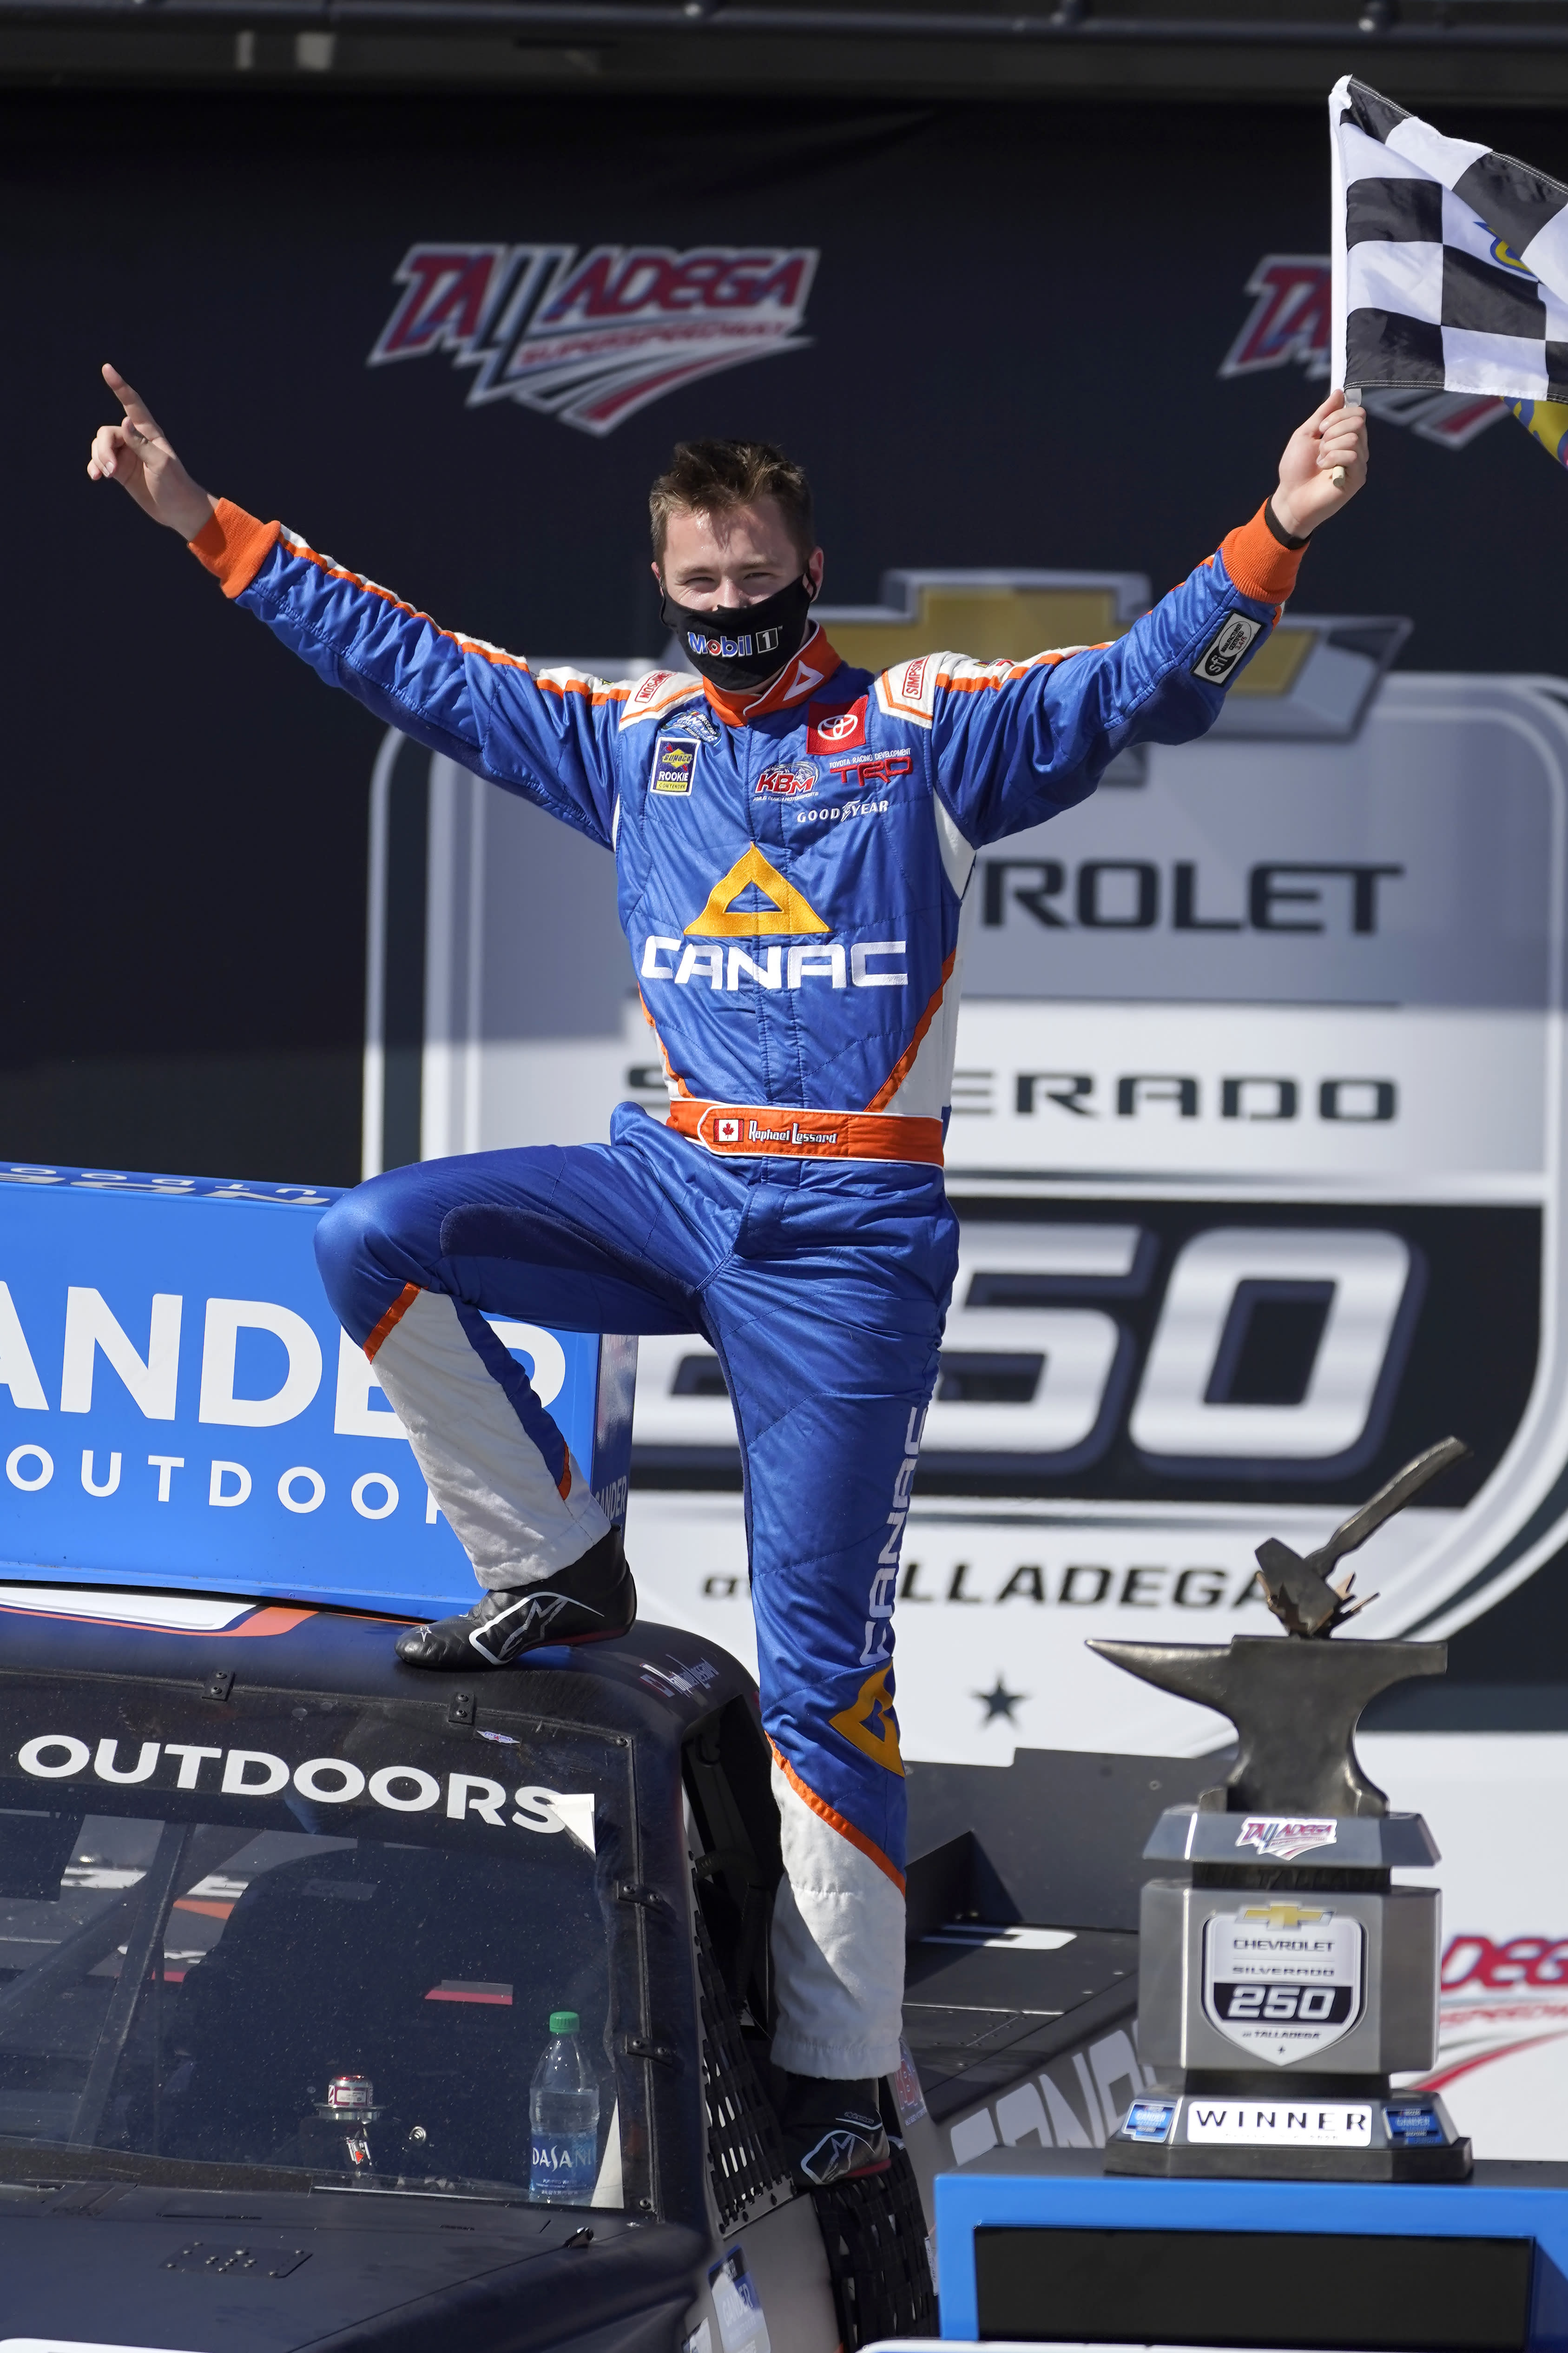 Raphael Lessard celebrates in Victory Lane after winning the NASCAR Truck series auto race at Talladega Superspeedway, Saturday, Oct. 3, 2020, in Talladega, Ala. (AP Photo/John Bazemore)